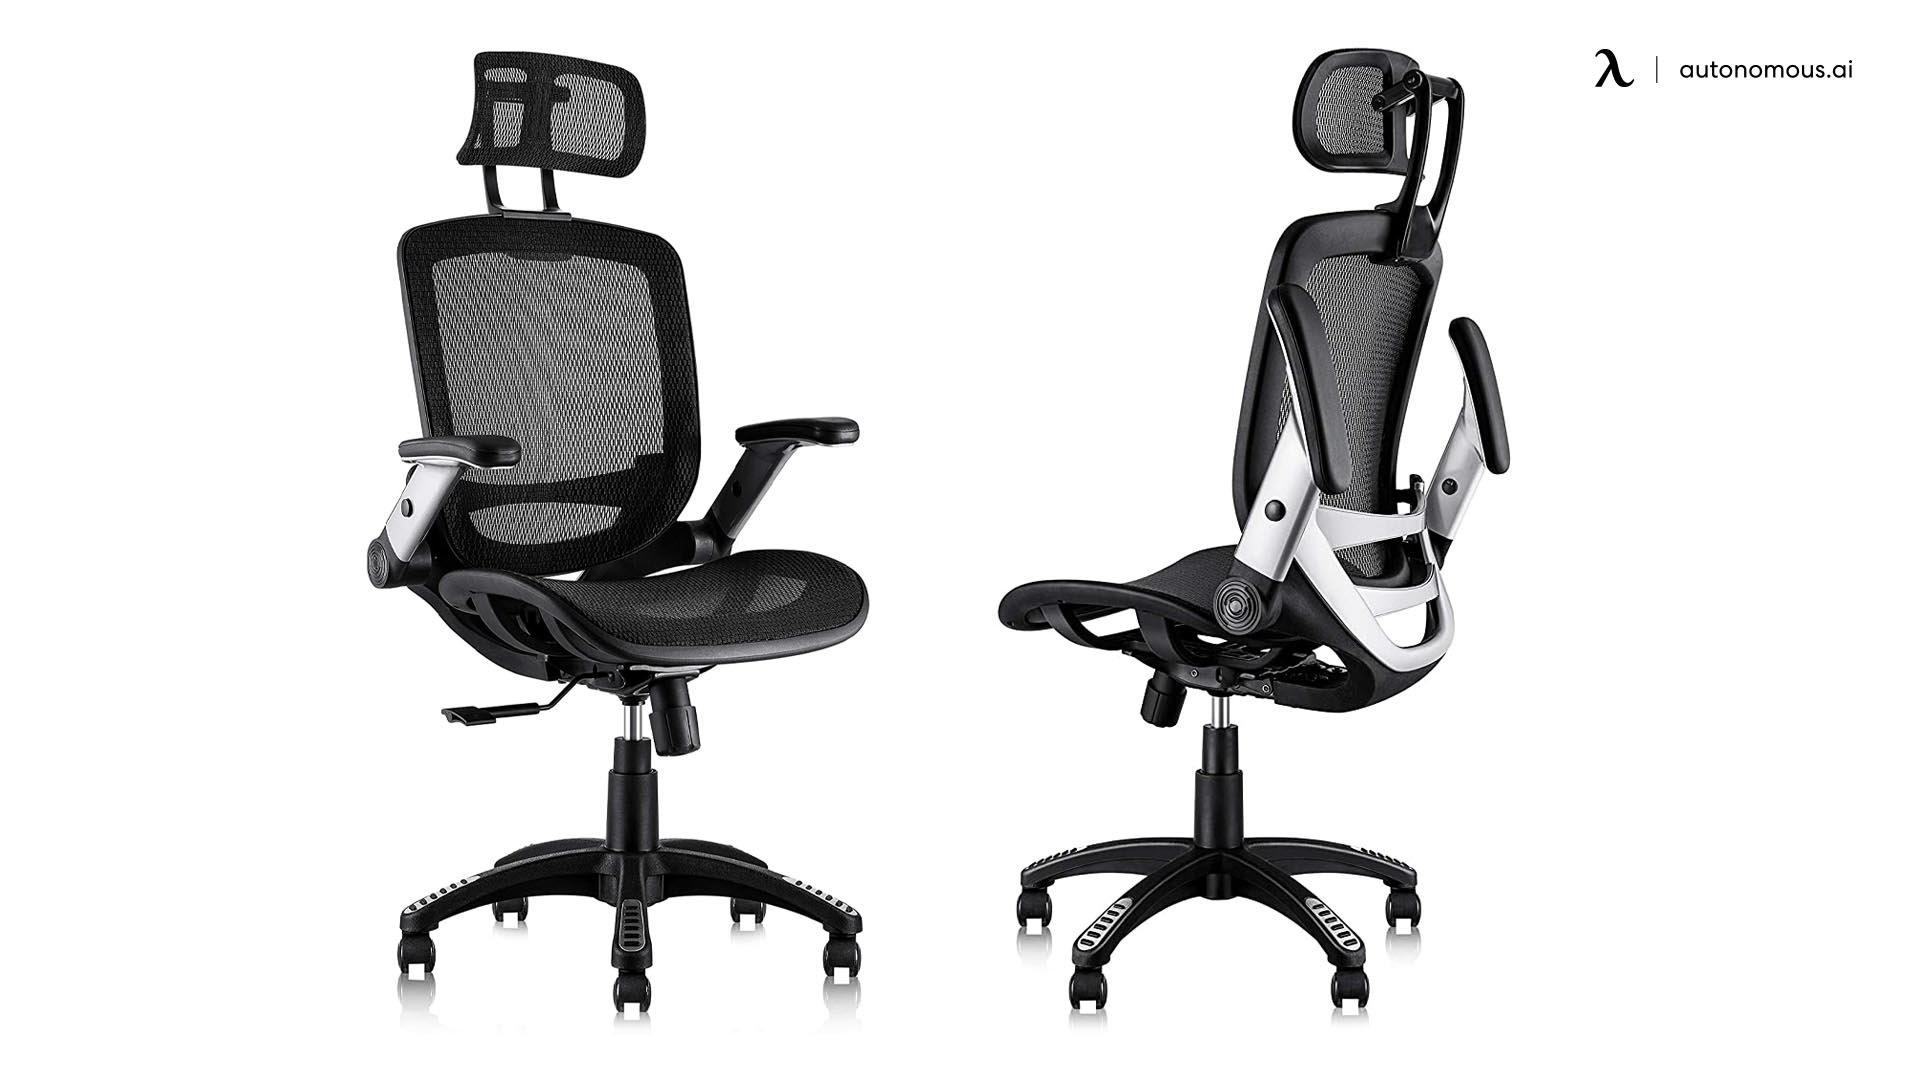 Gabrylly Mesh Ergonomic Chair